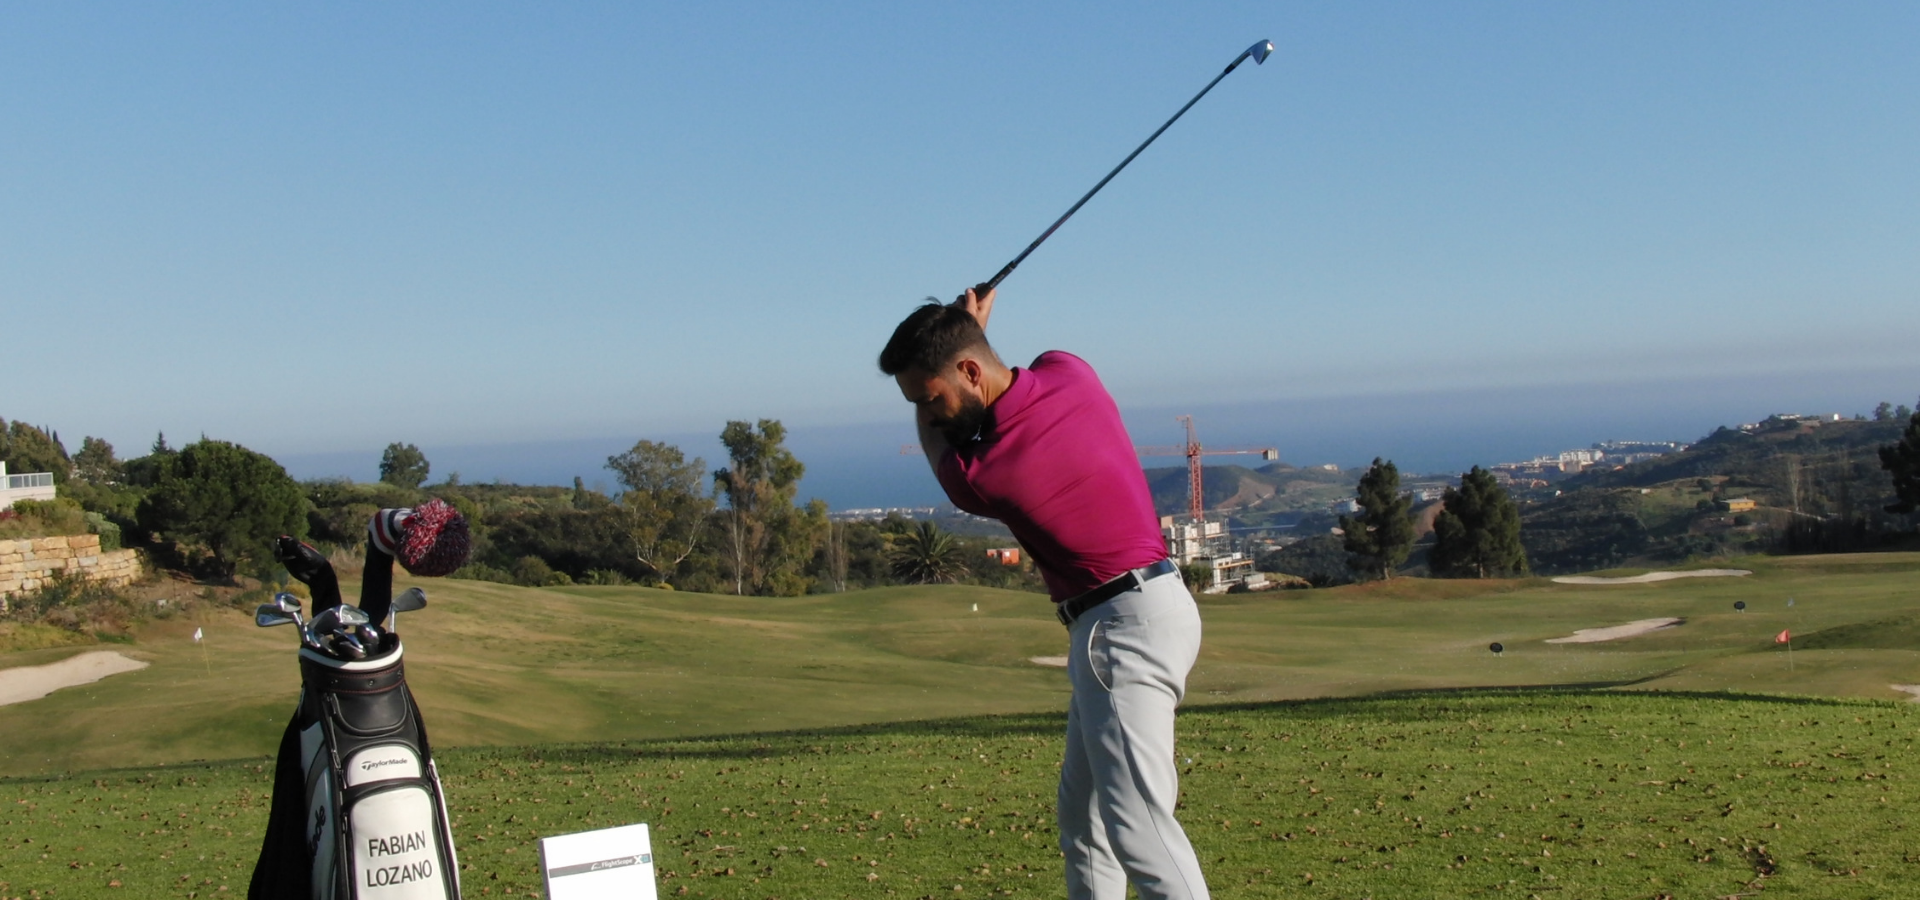 fabian lozano golf profesional marbella